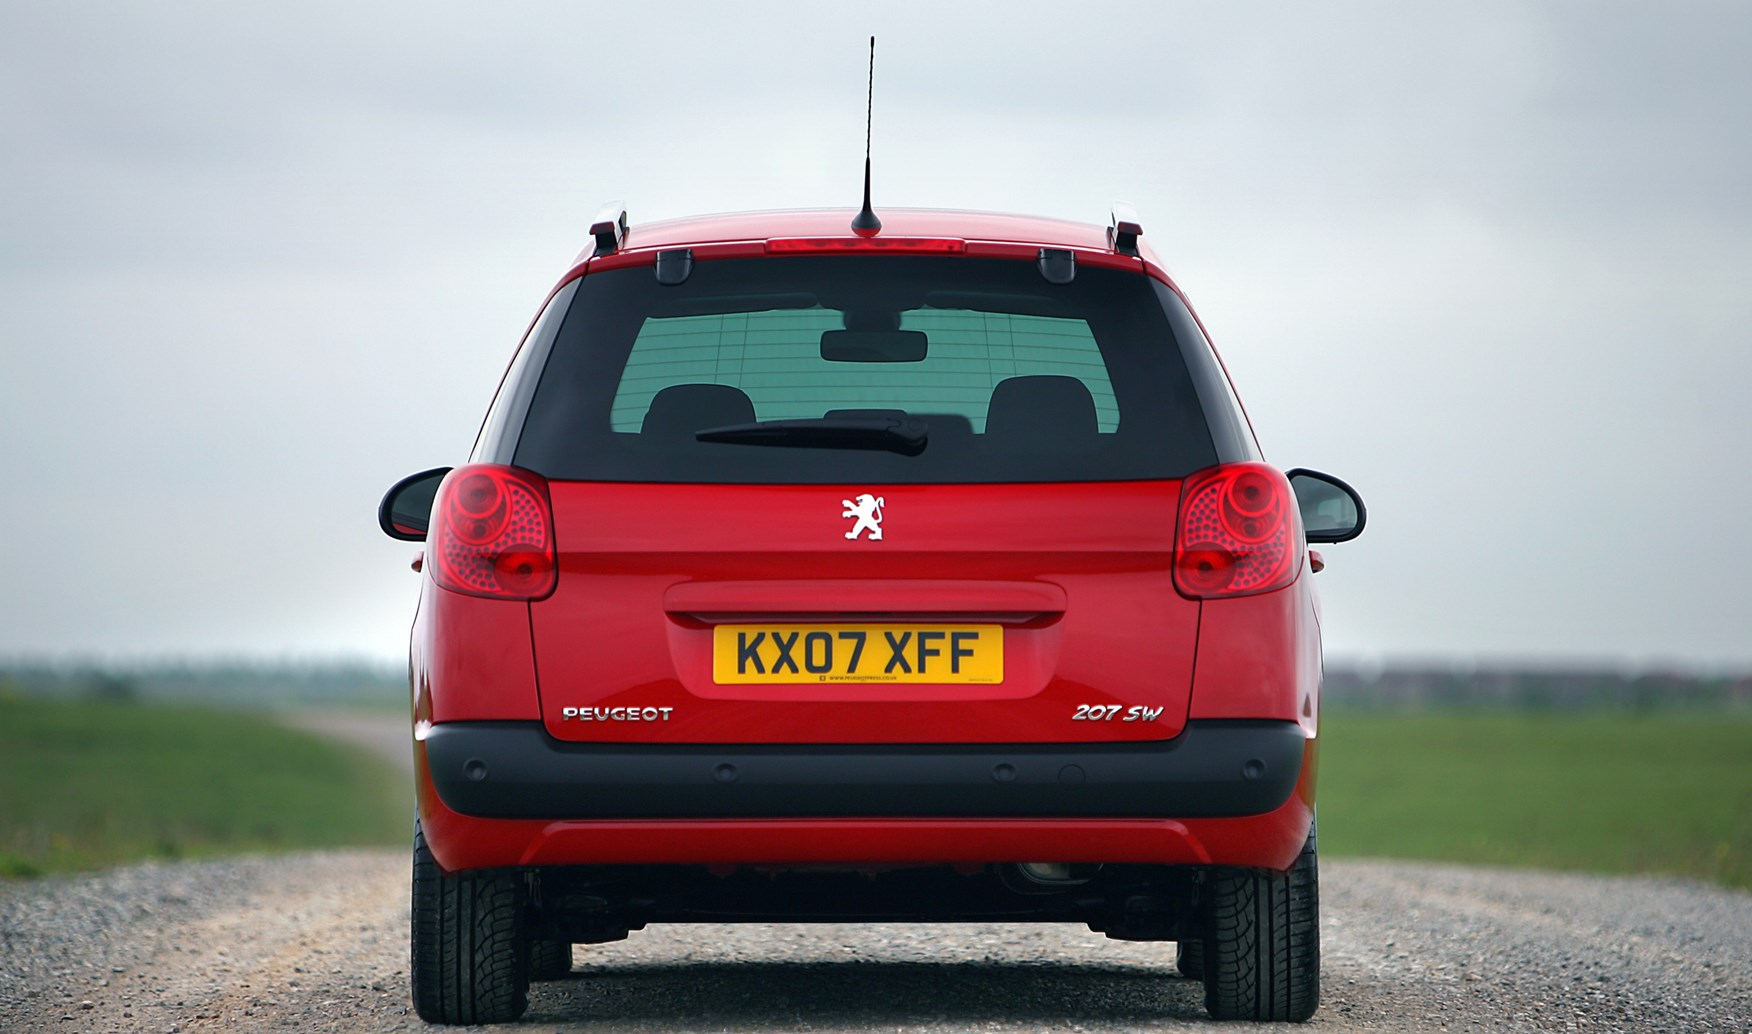 Peugeot 207 Sw 2007 2013 Running Costs Parkers Under Bonnet Fuse Box